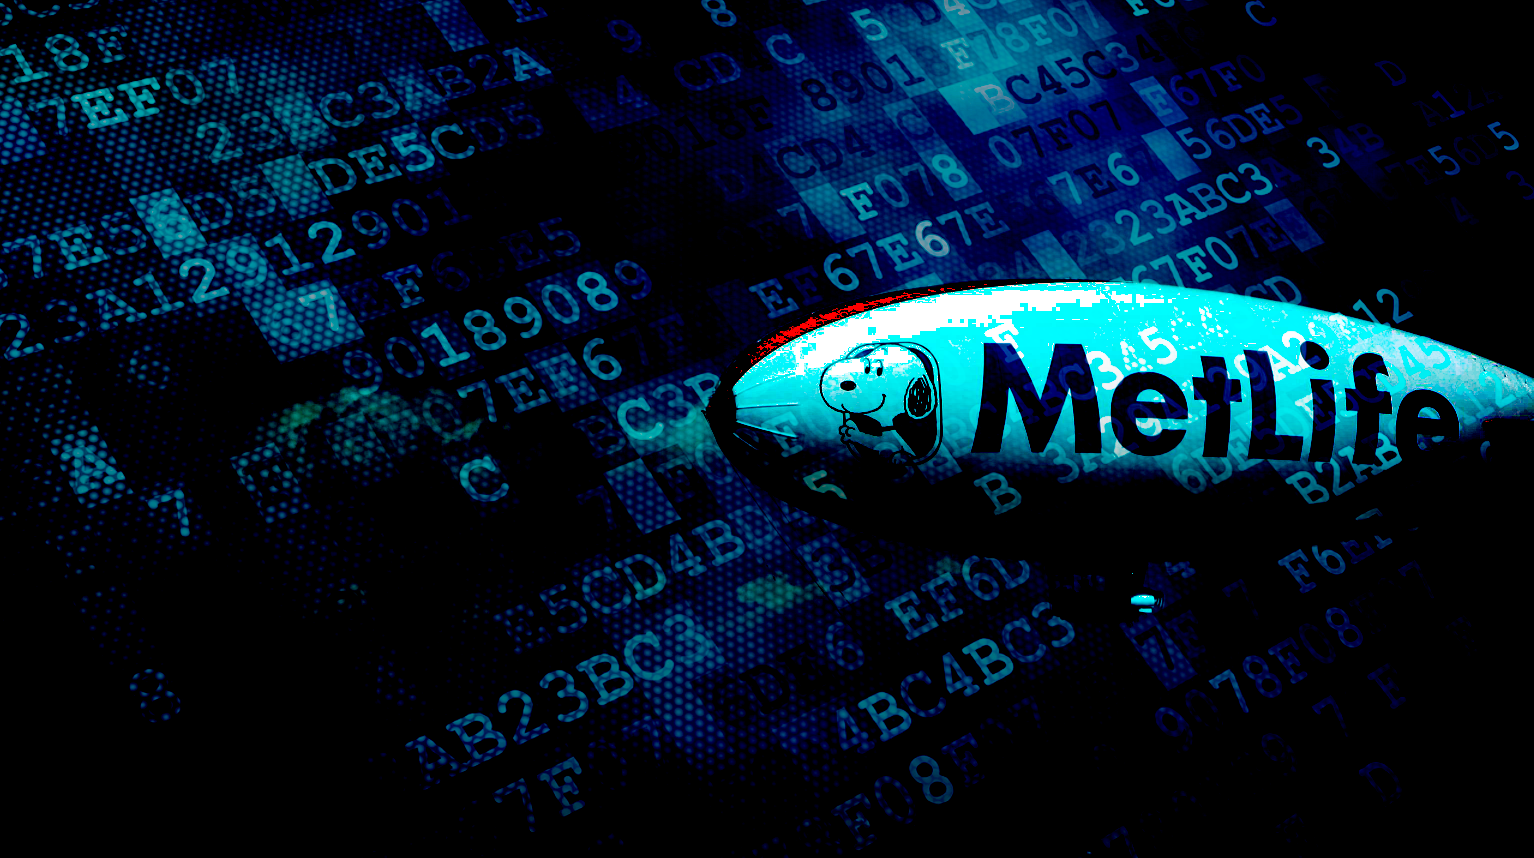 softpedia.com - Sergiu Gatlan - Data Leak Incident Reported by Fortune 500 Metropolitan Life Insurance Company